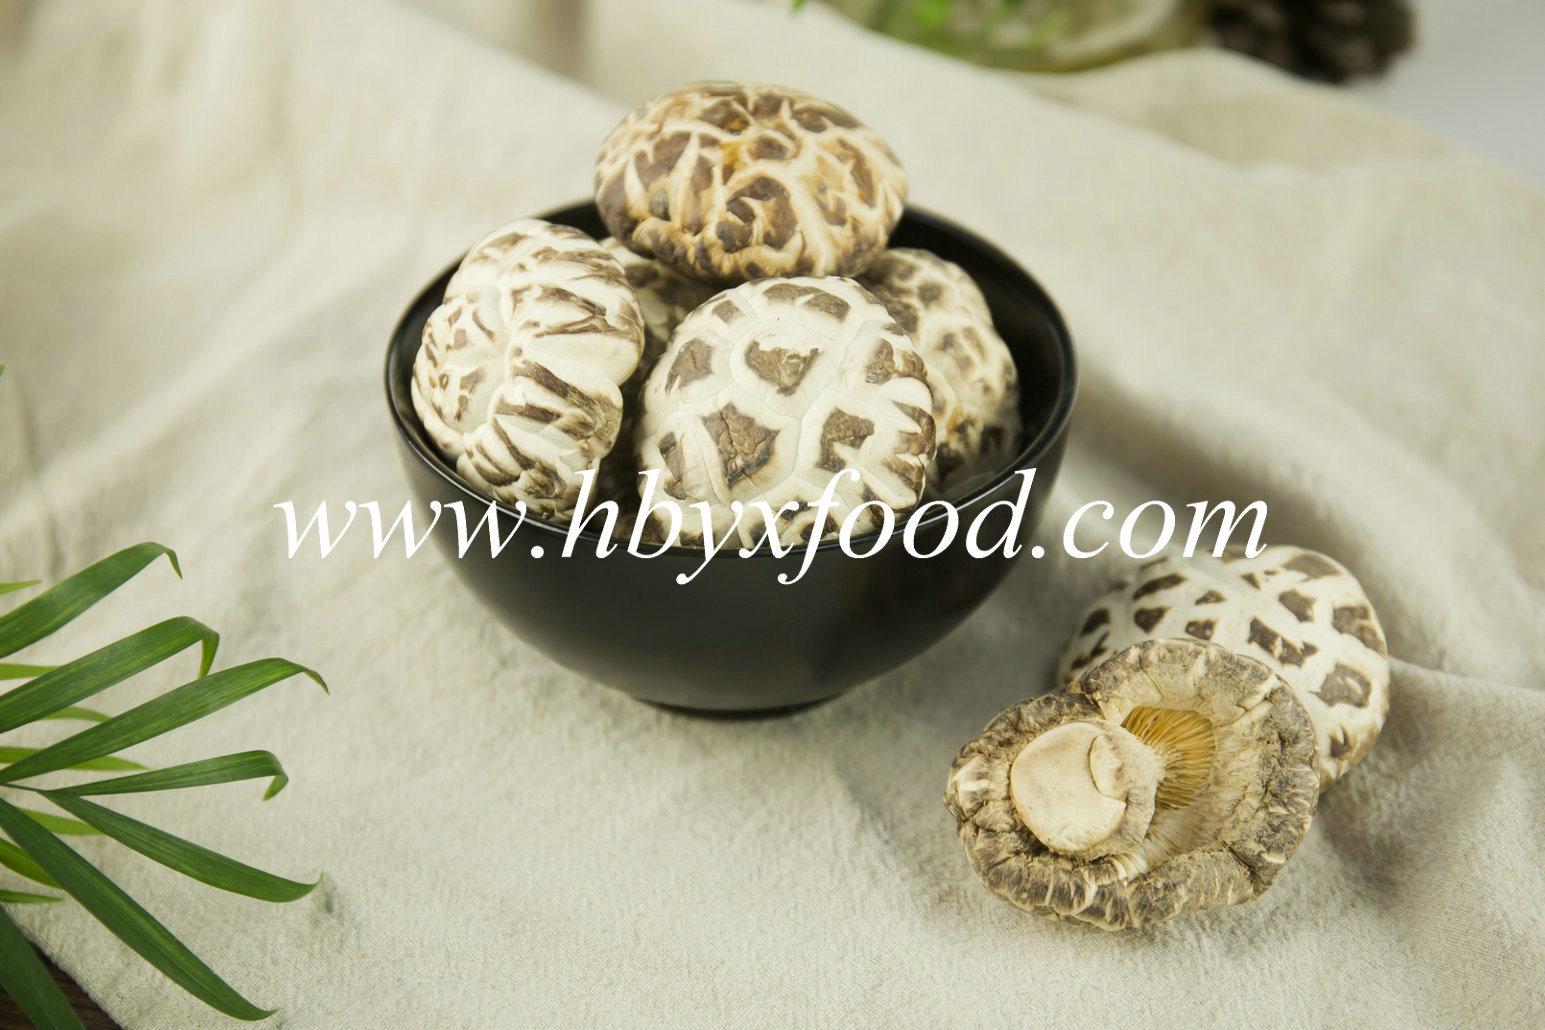 China High Quality Dried Vegetable White Flower Mushroom Supplier